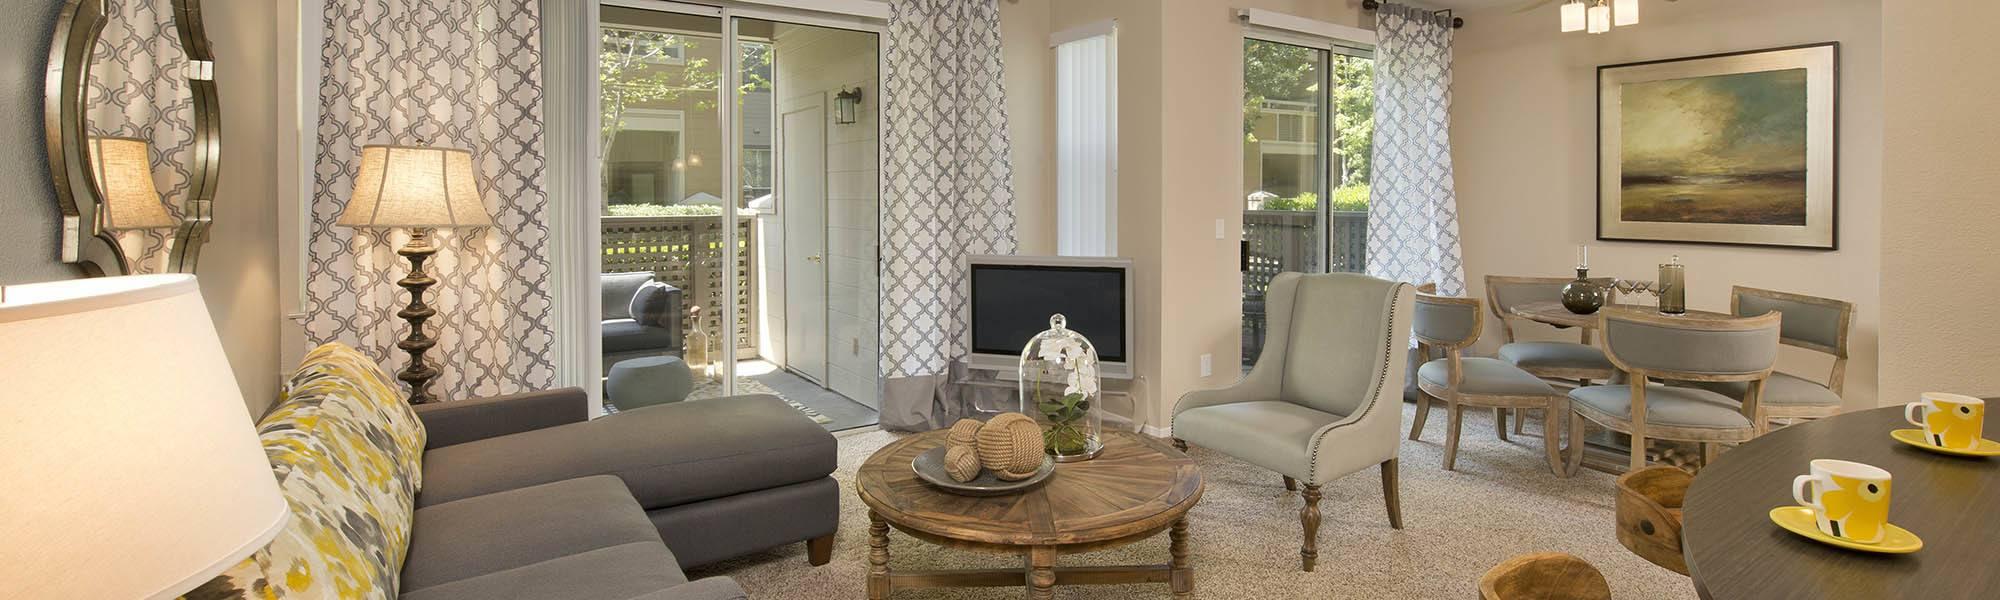 Luxury 1 2 3 Bedroom Apartments In South San Jose Ca